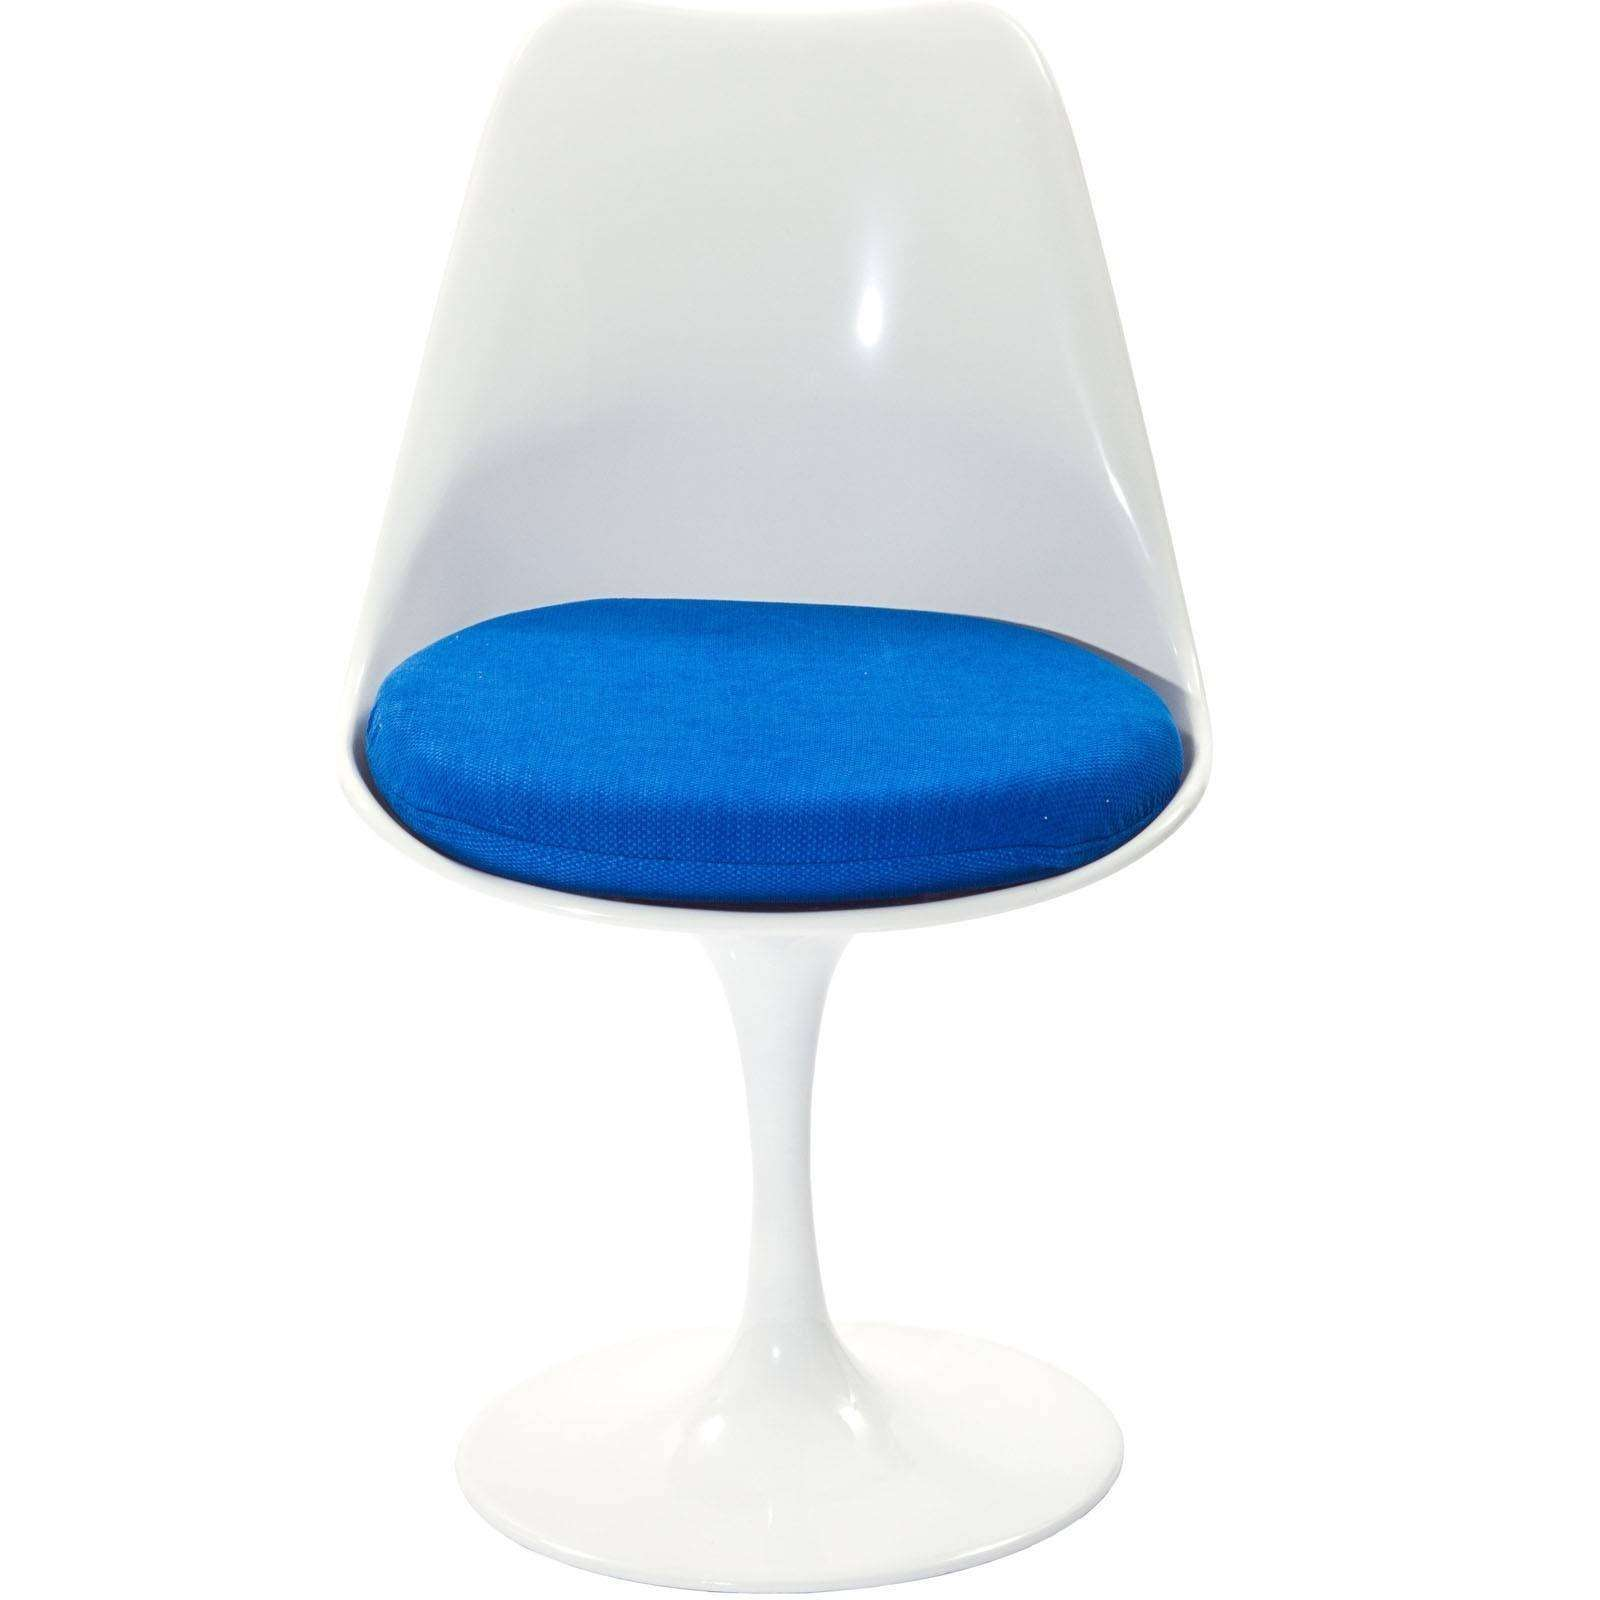 Eero Saarinen Style Tulip Side Chair